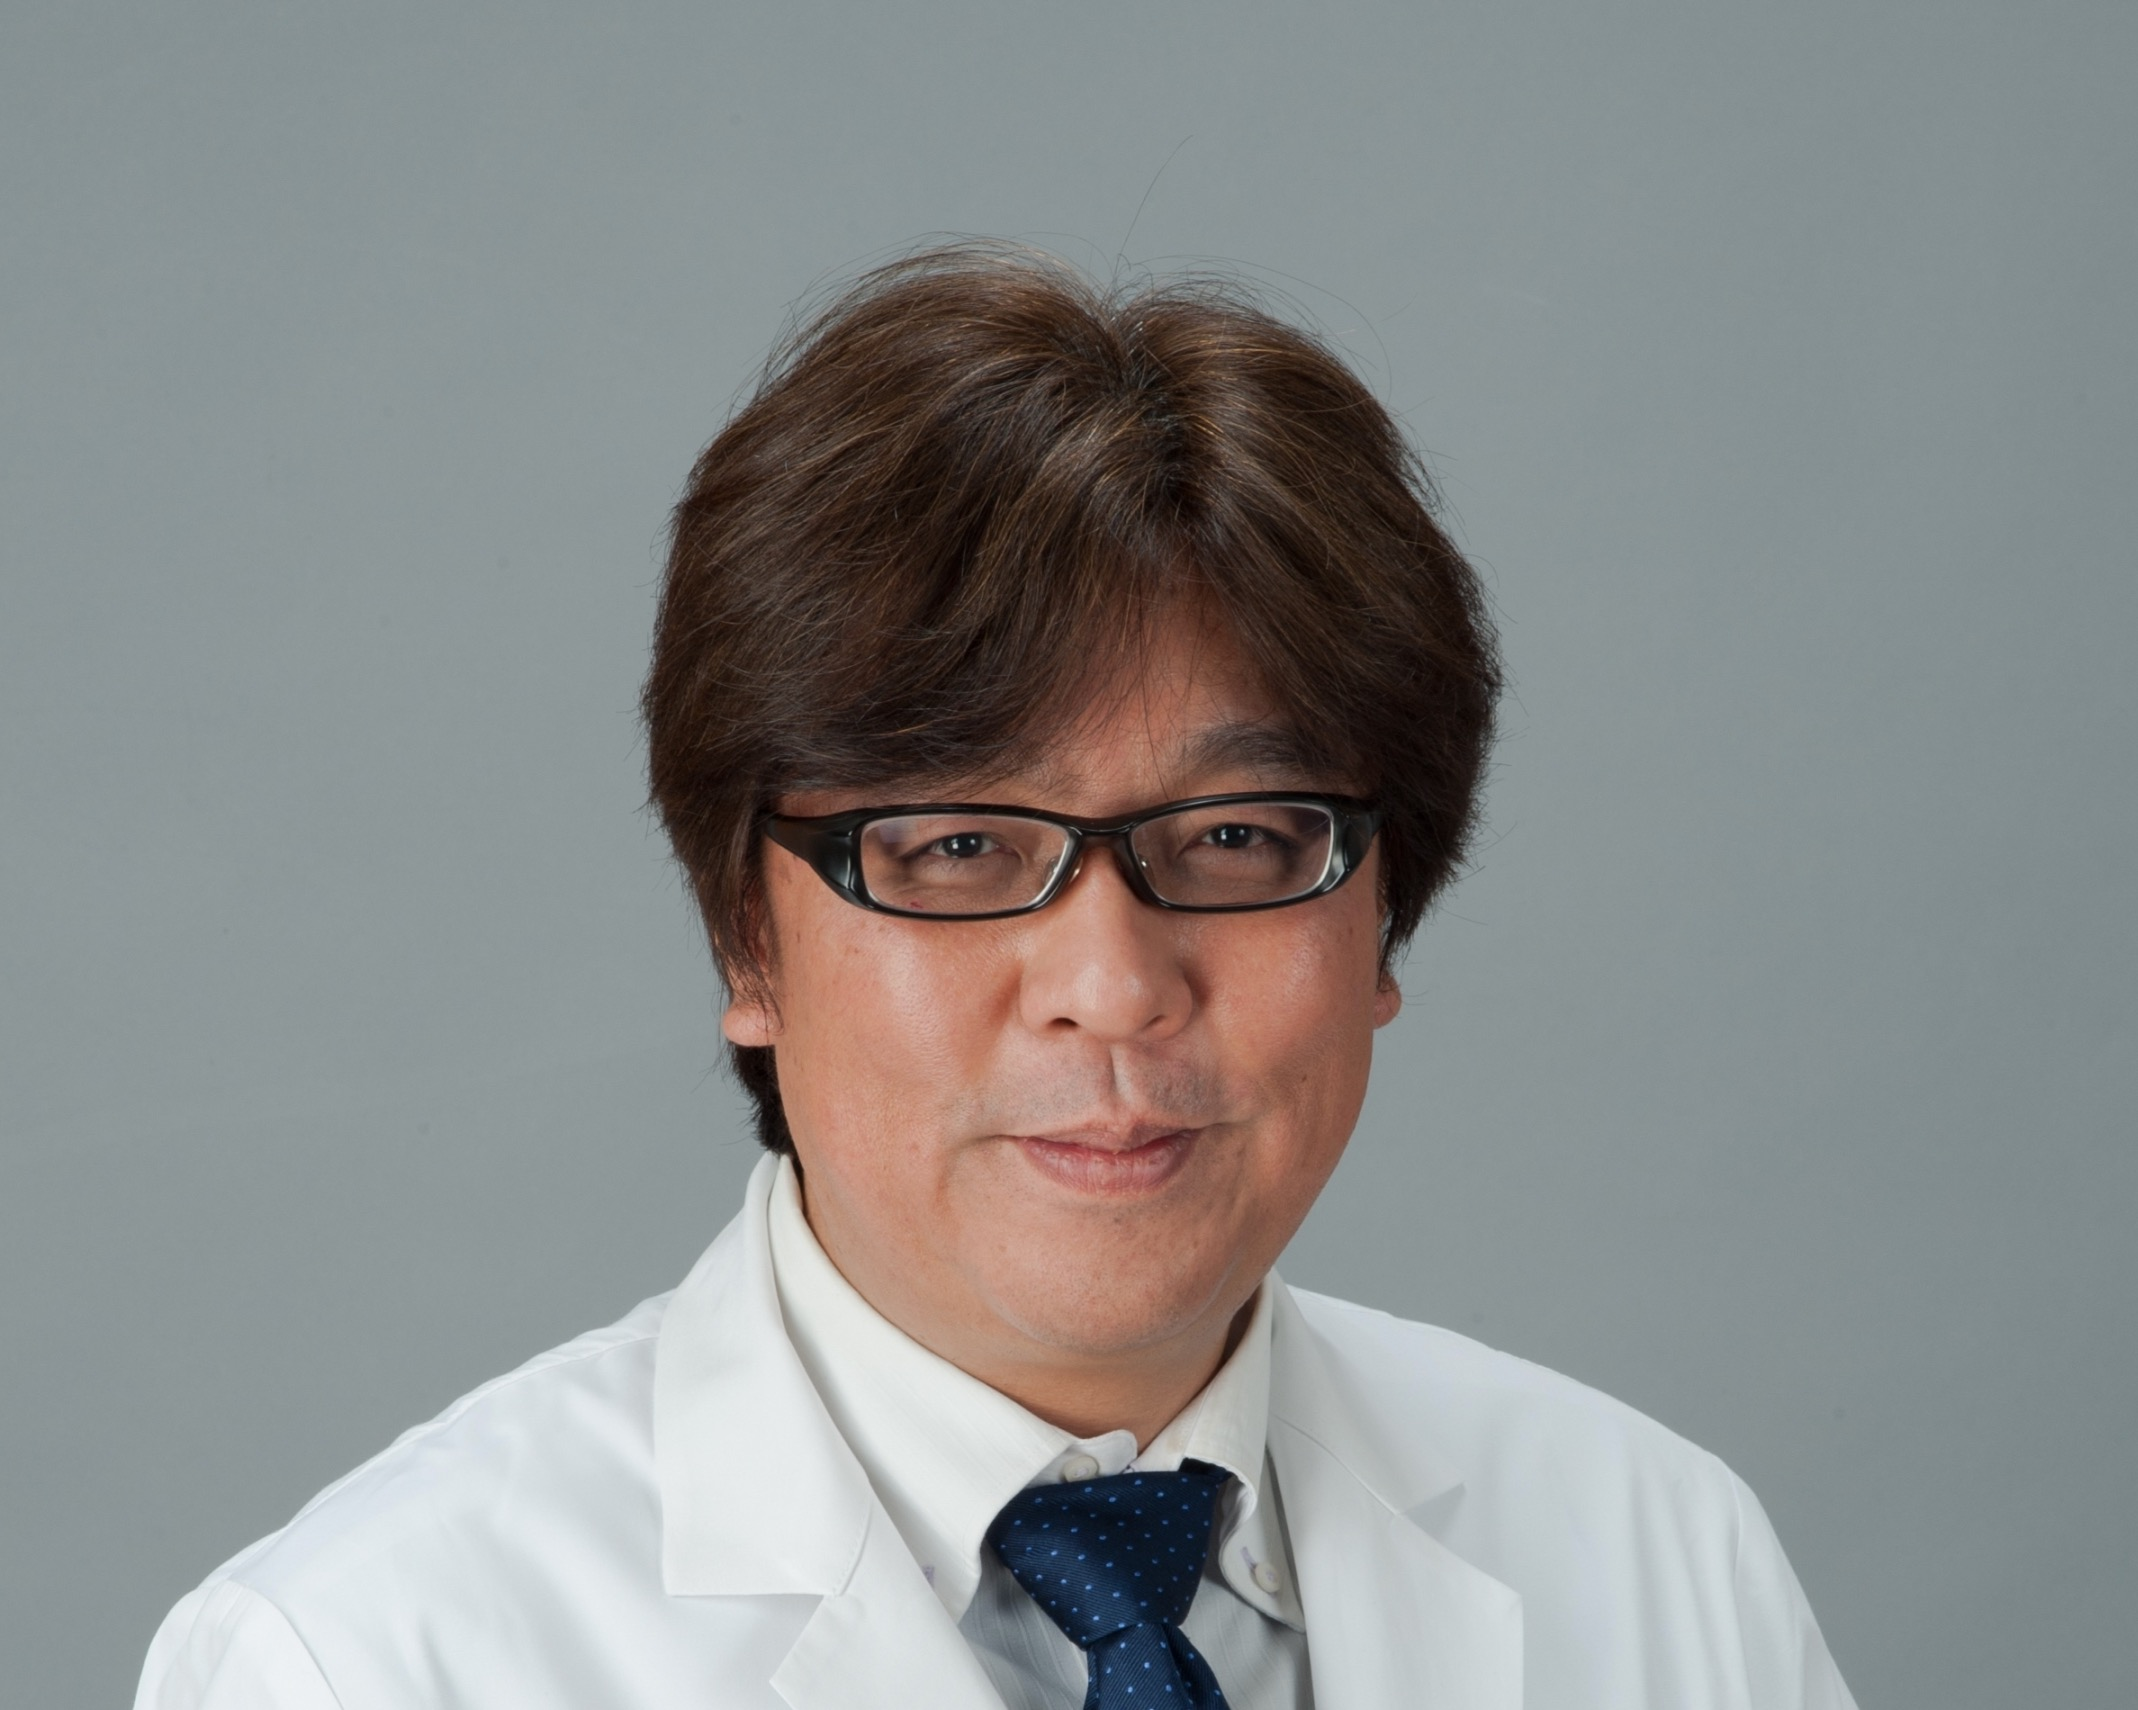 国立がん研究センター東病院 消化管内科長吉野 孝之医師